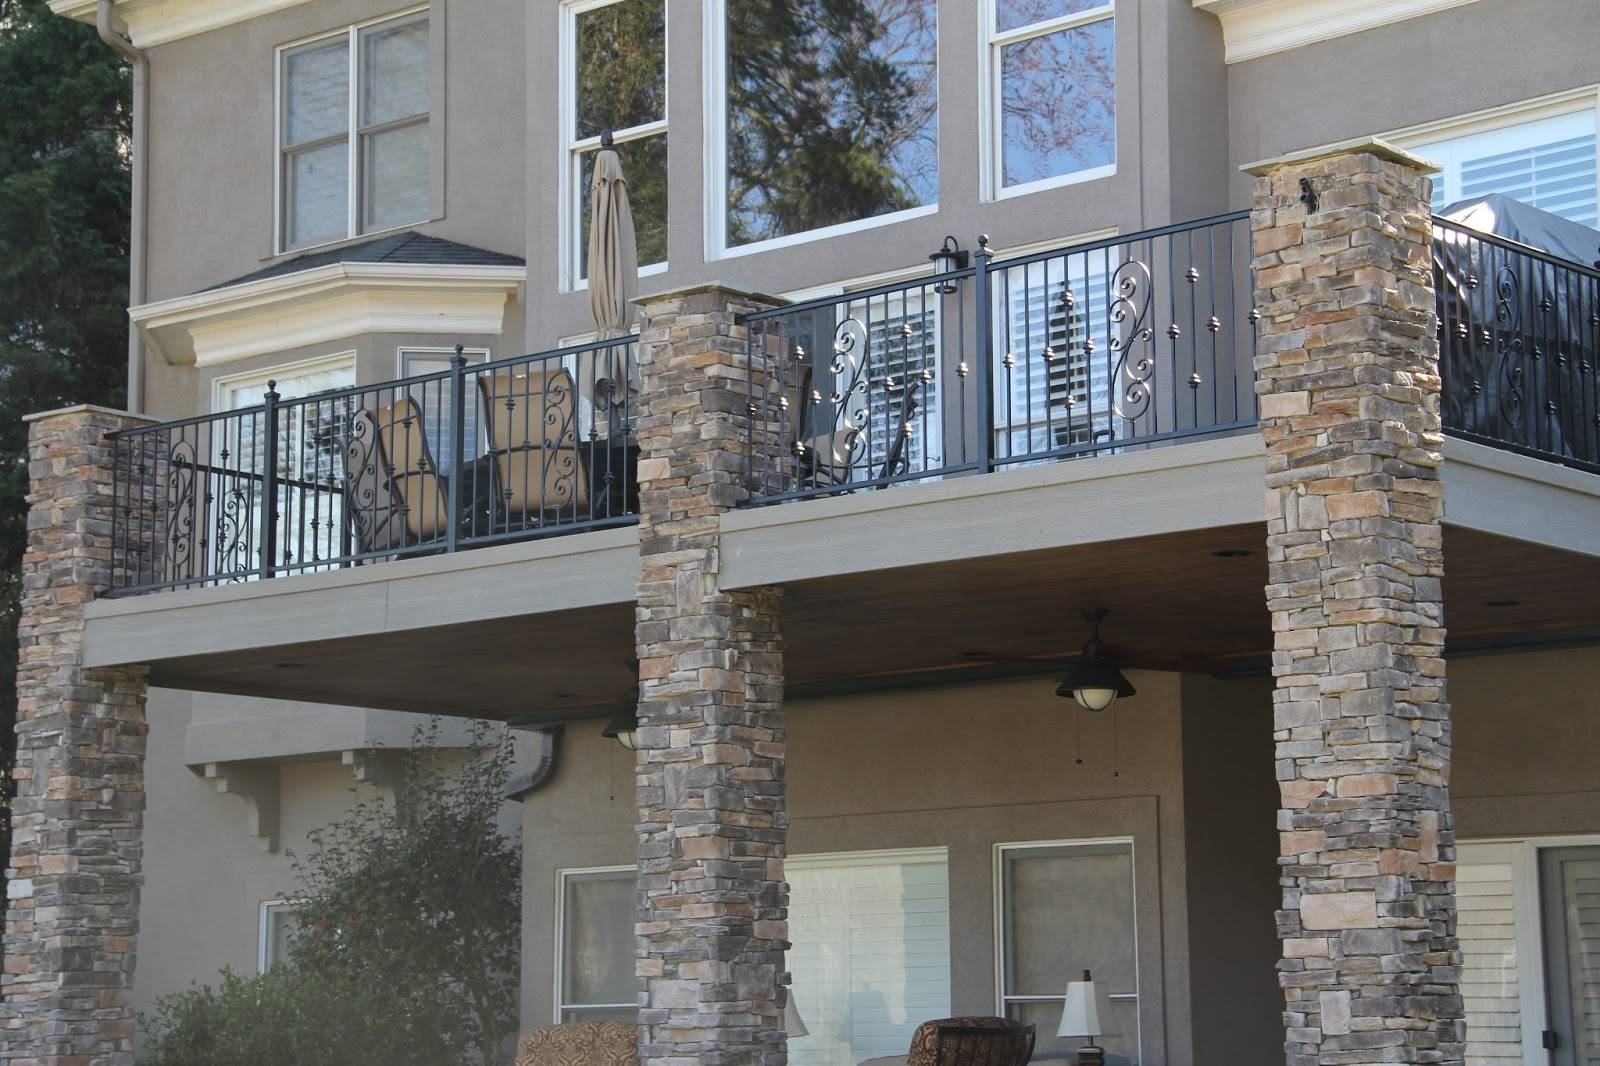 Modern Homes Wrought Iron Balcony Railing Designs Ideas